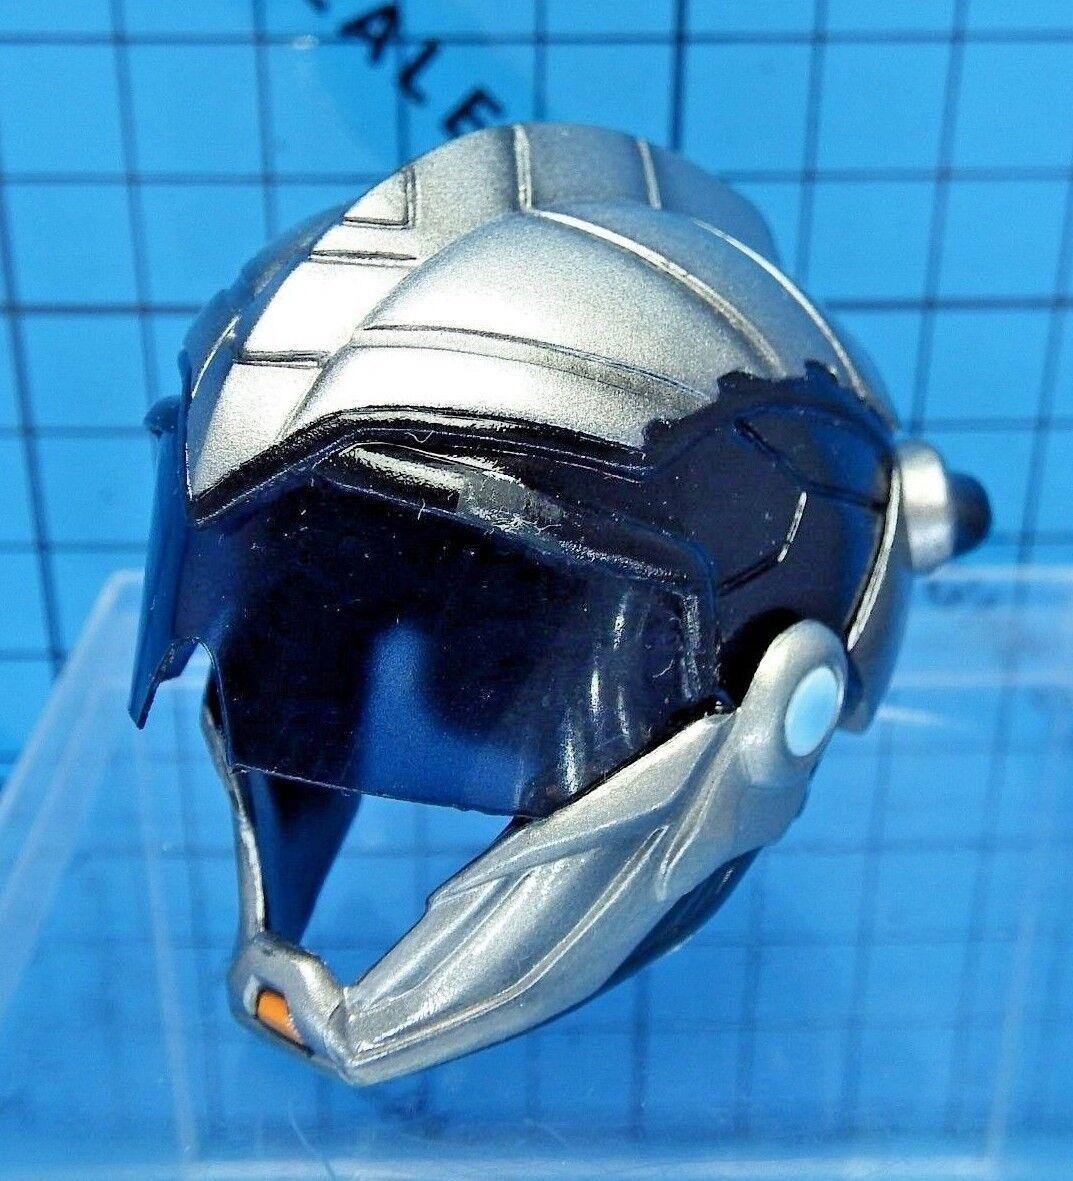 TBLeague 1 6 Galaxy Soldier PL2017-110 Figure Figure Figure - Helmet a74e47